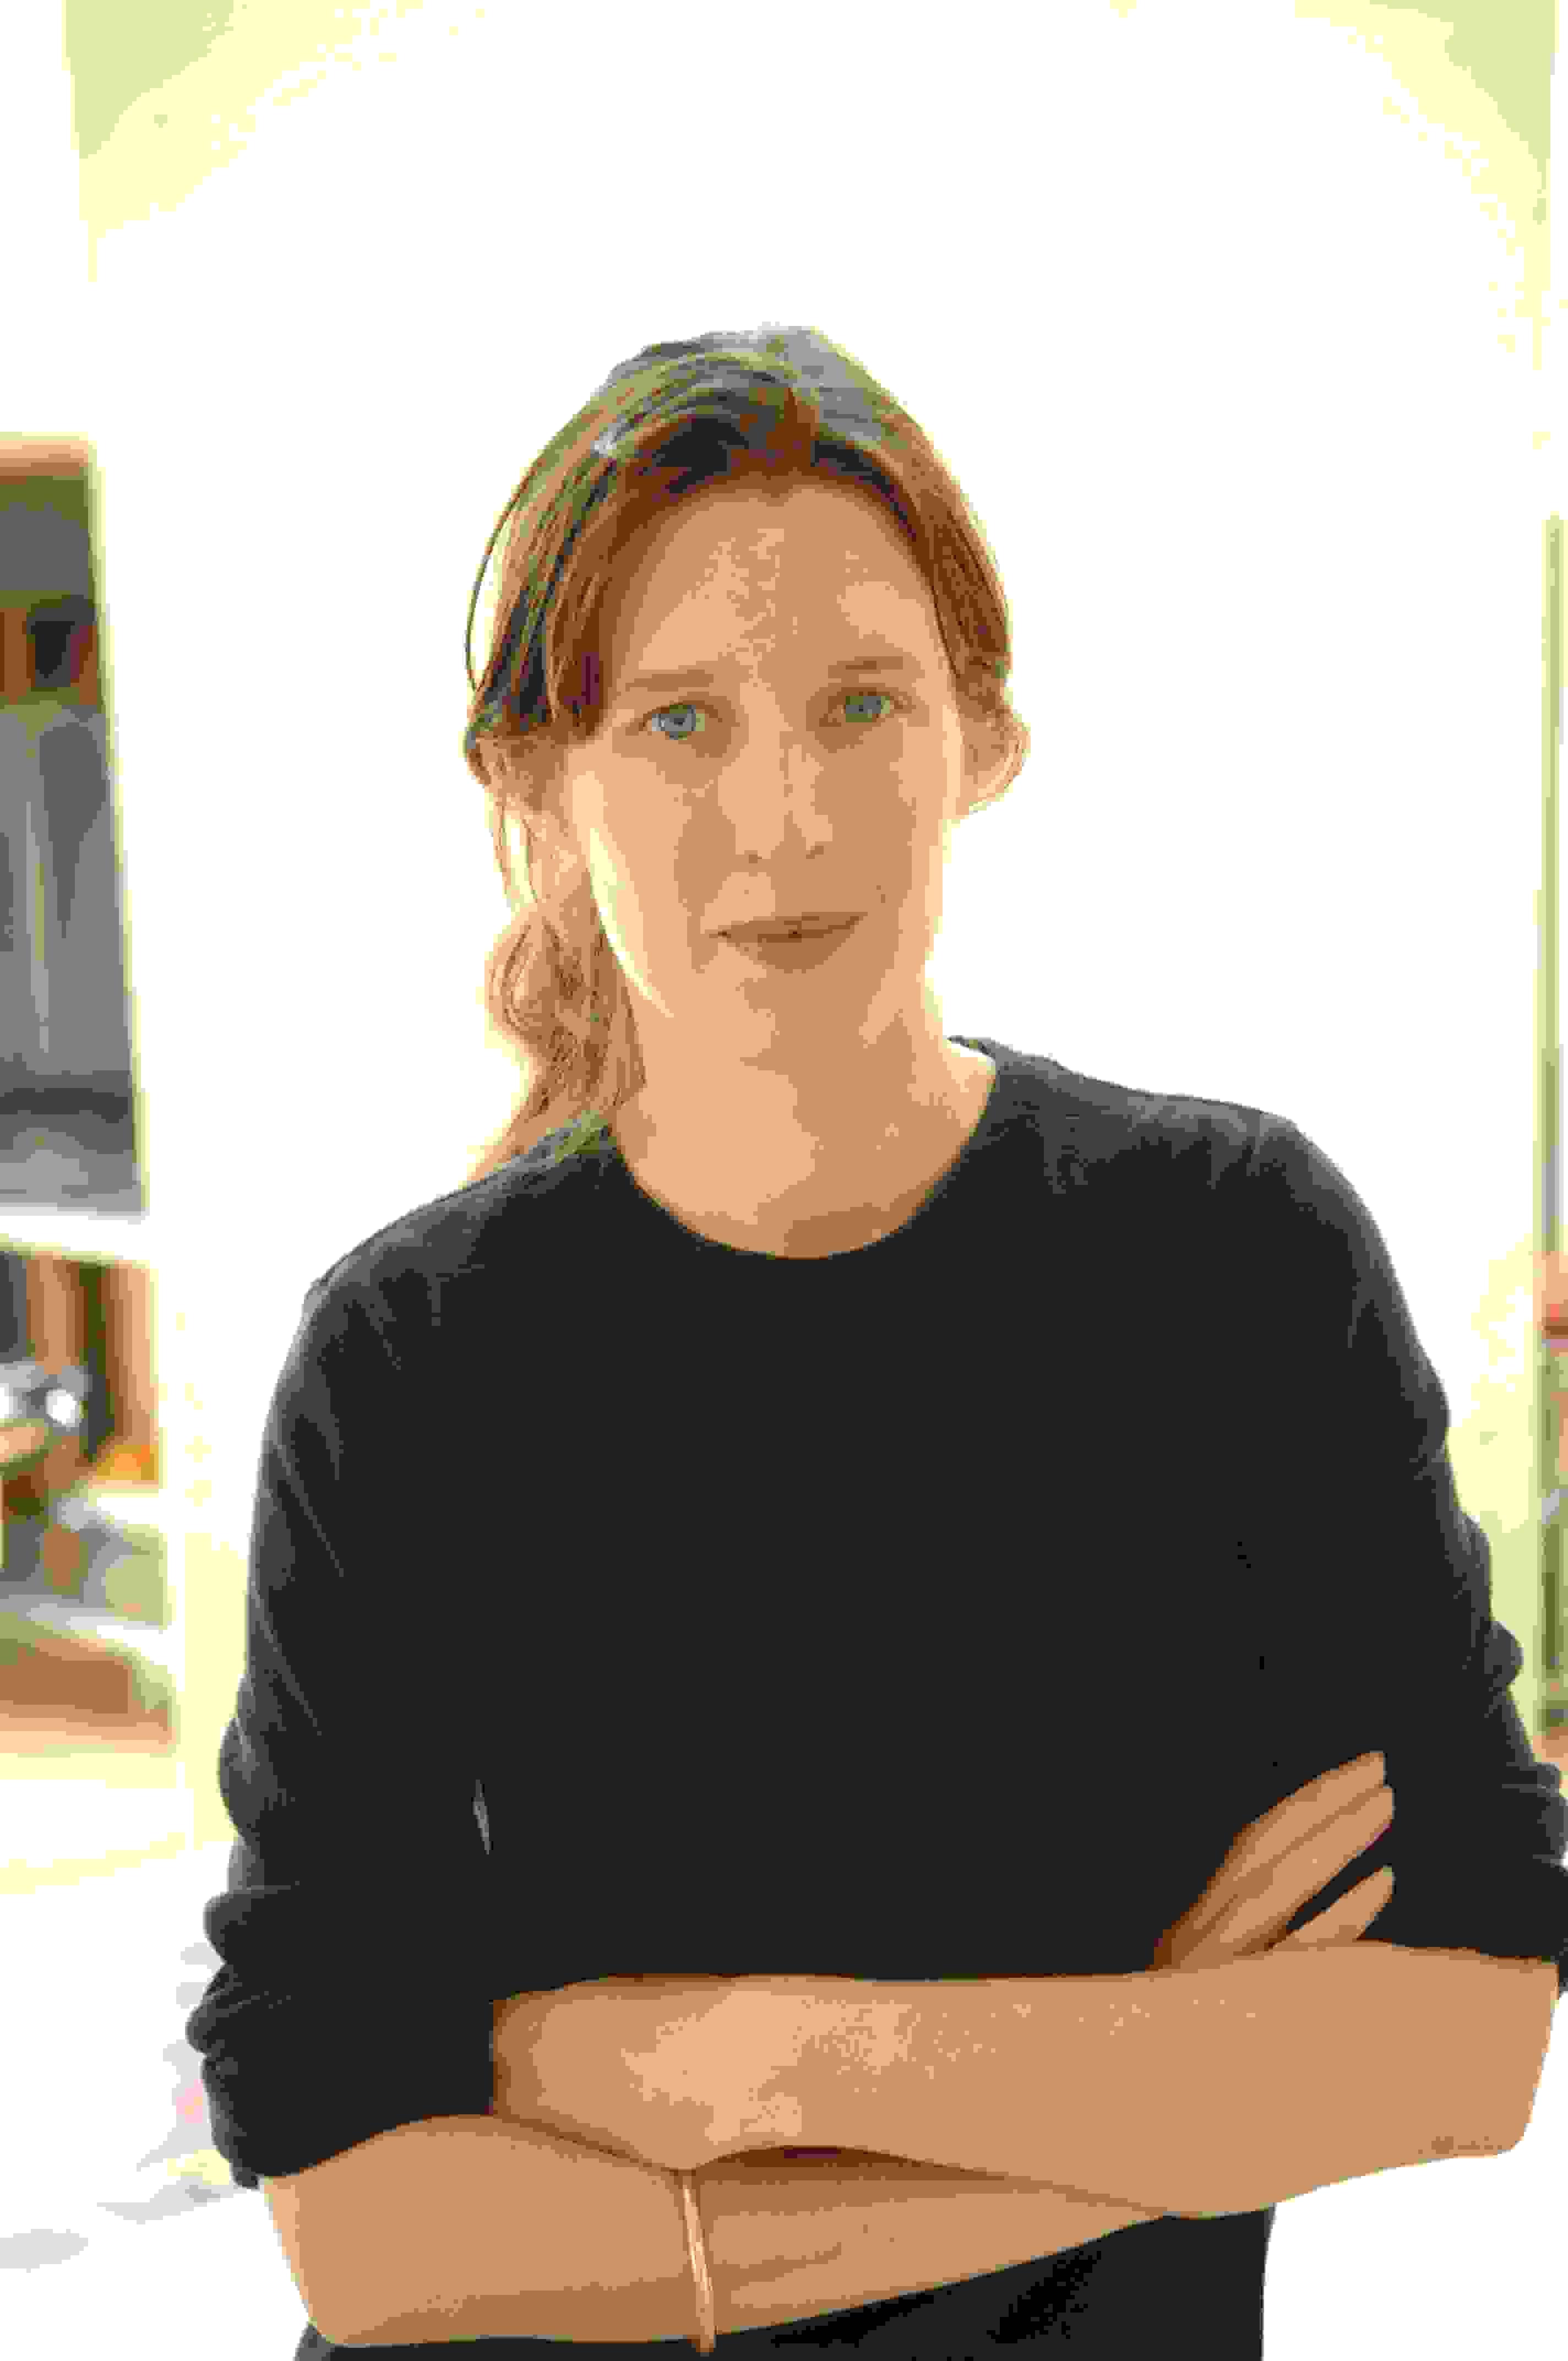 Chloe Hooper: The Arsonist